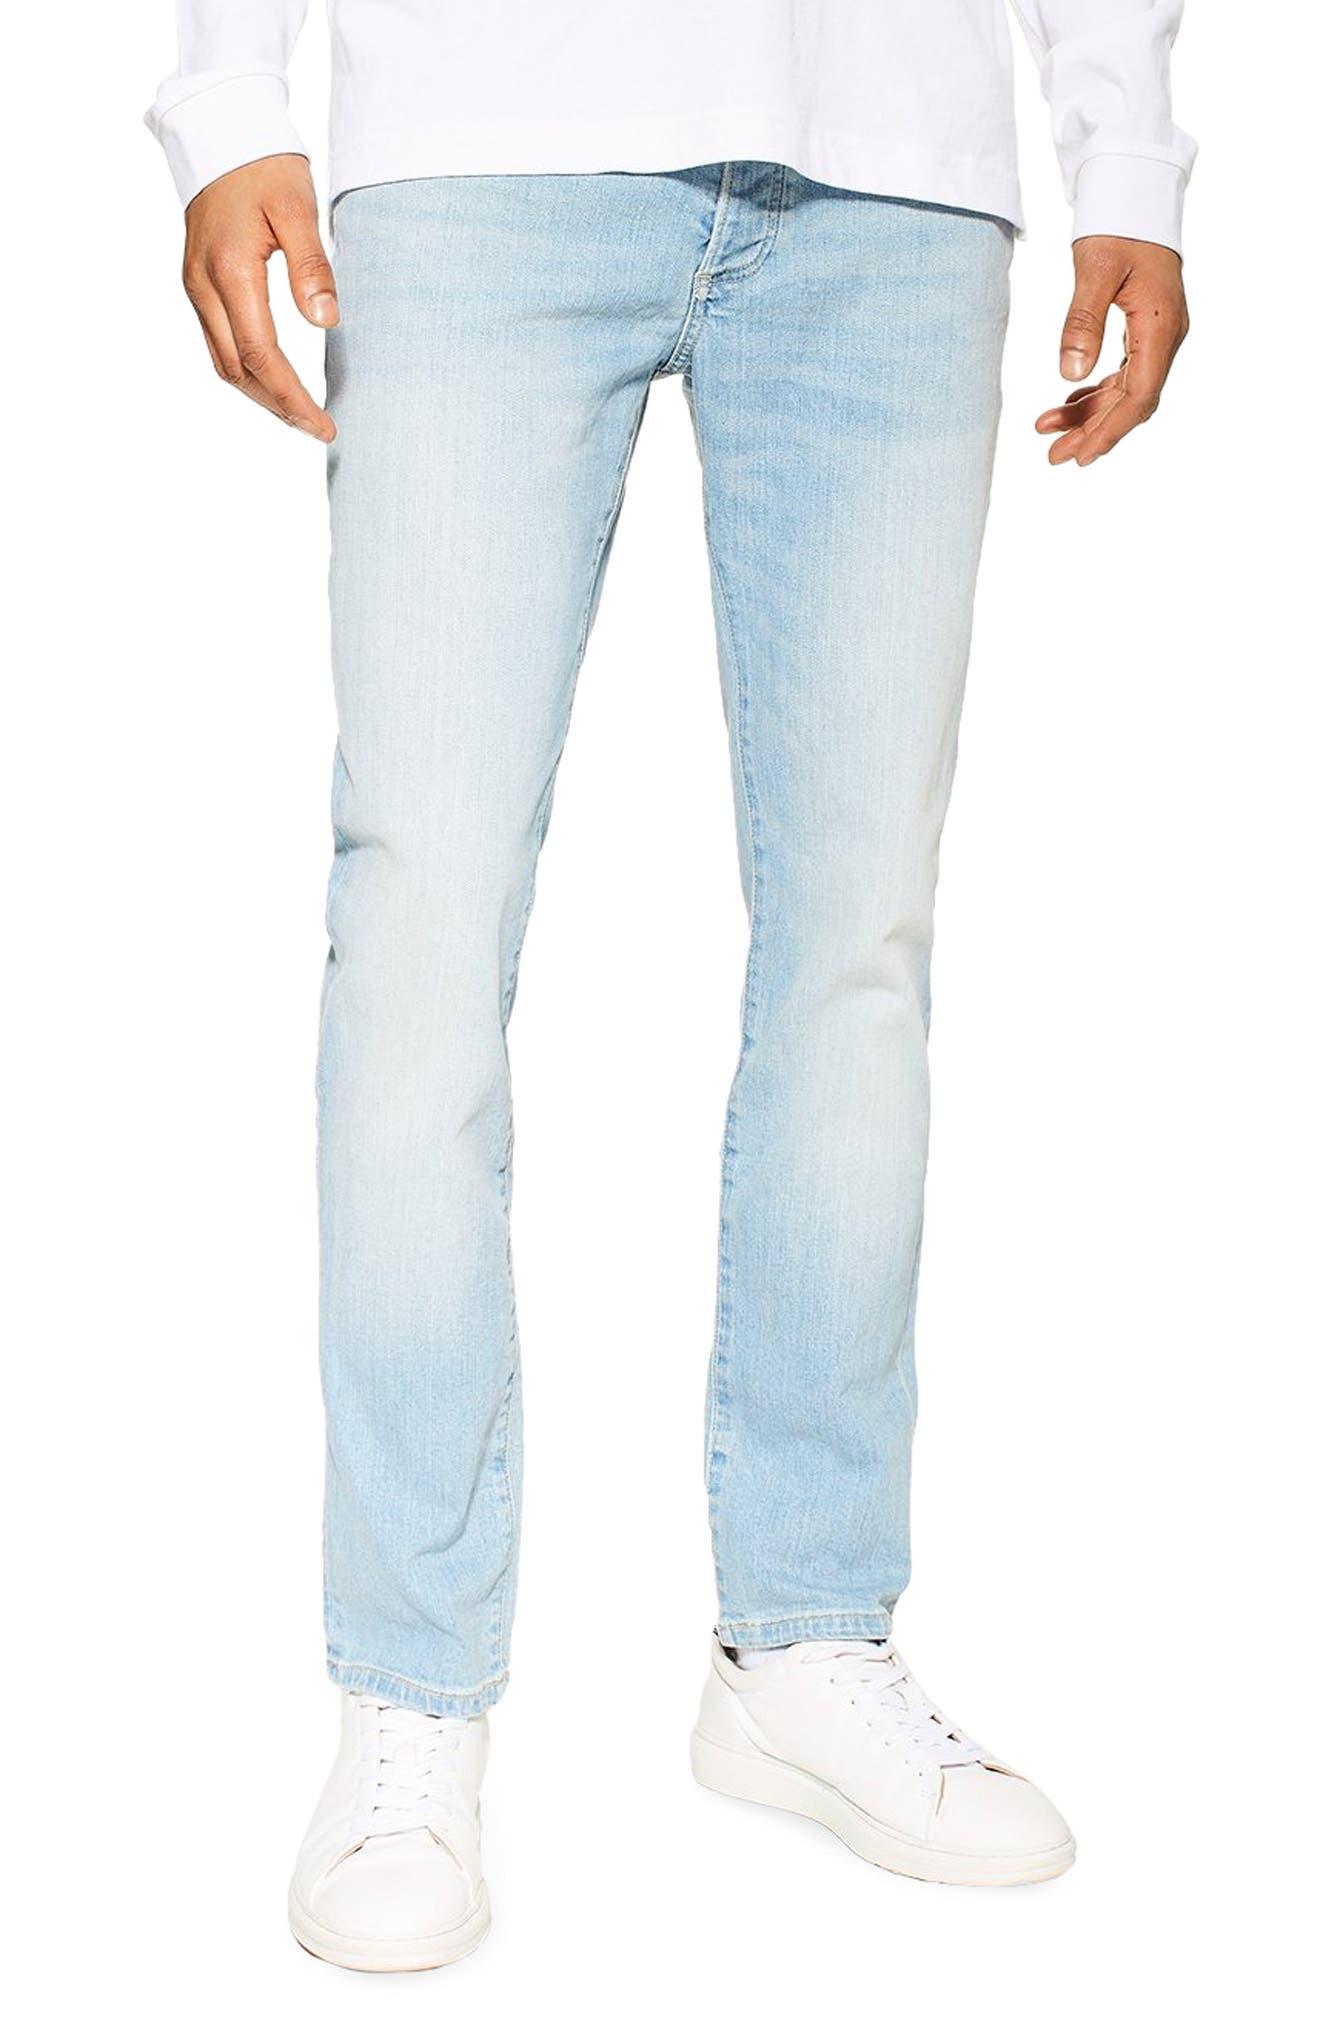 Topman Jeans Quality